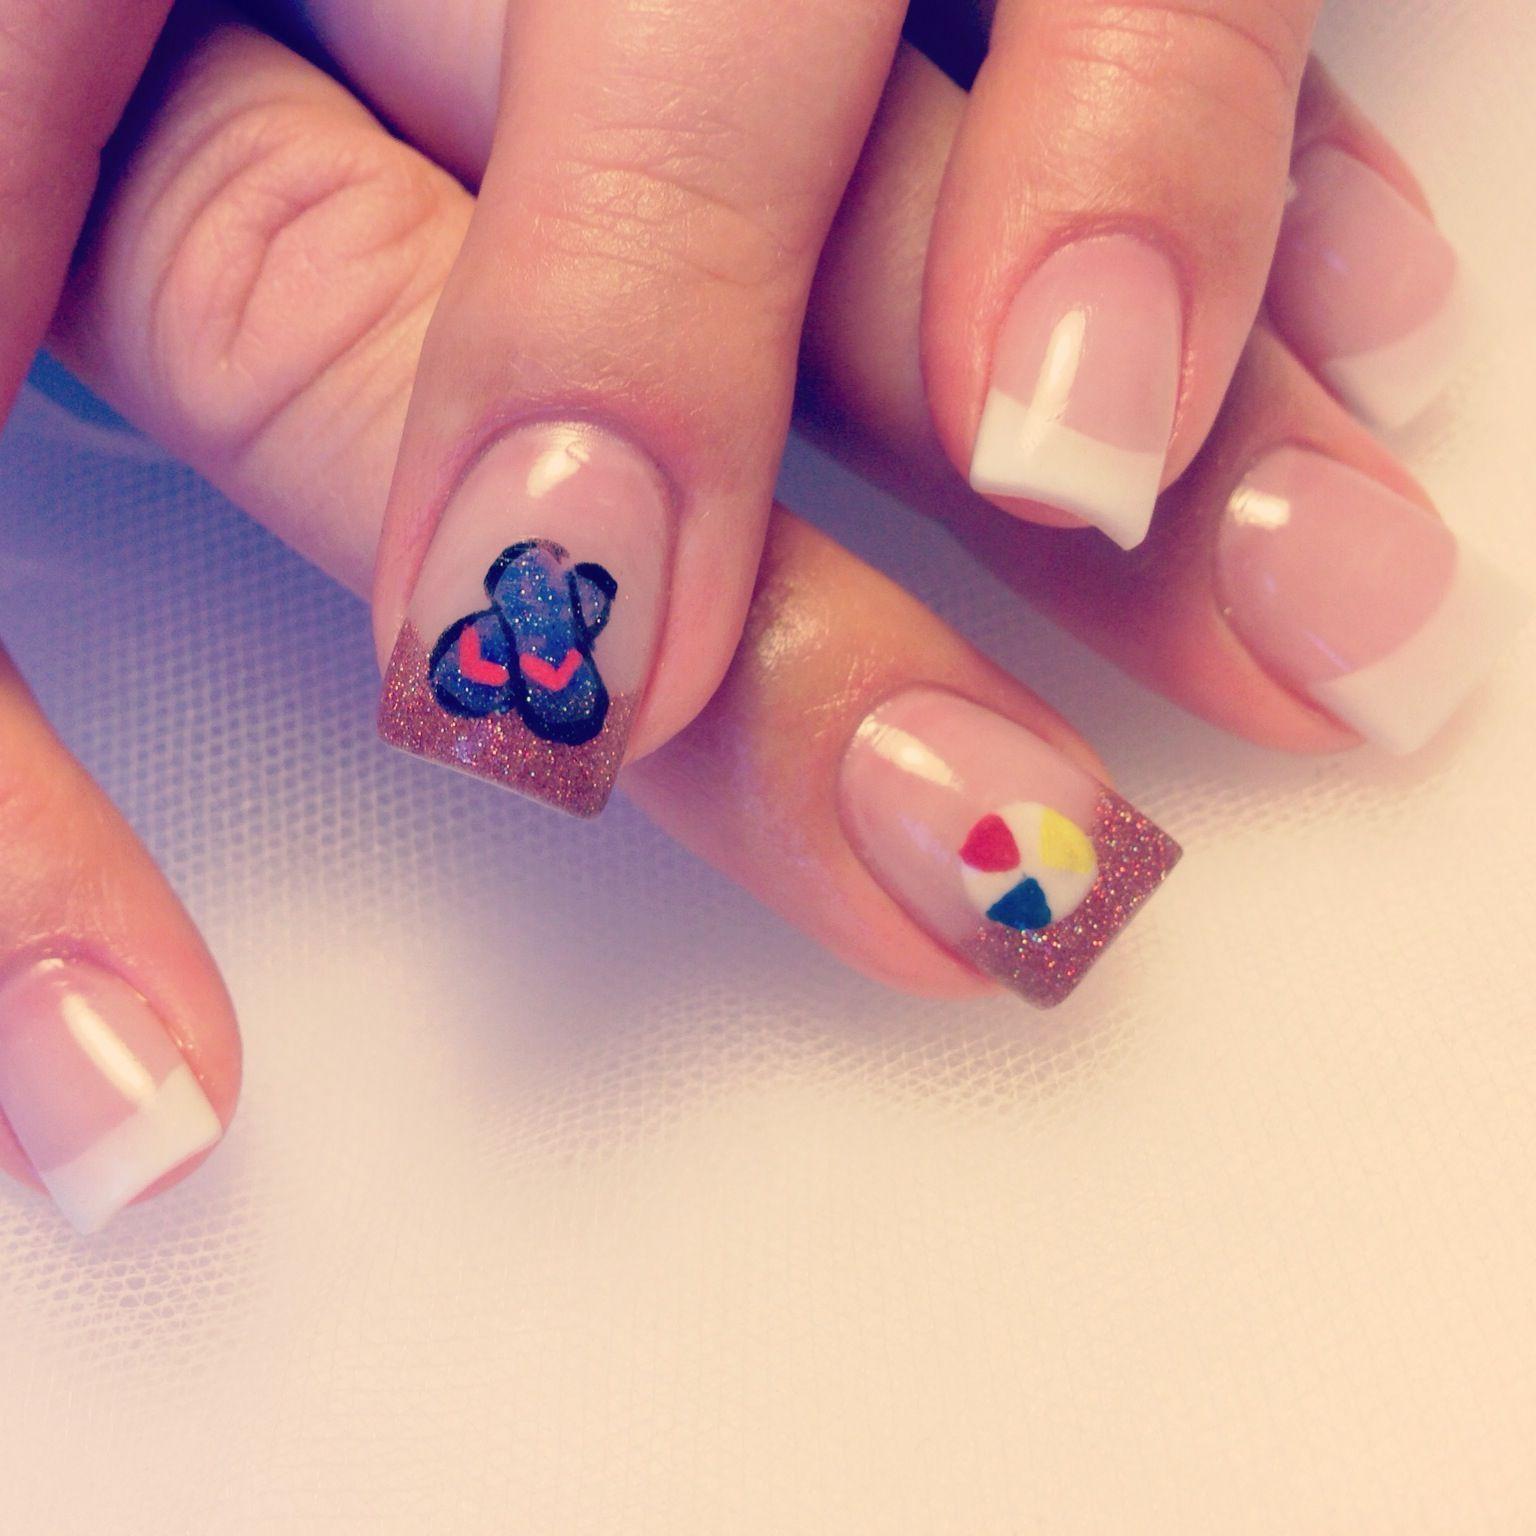 Flip Flops and a Beach Ball nail art | Nails: Summer Time ...